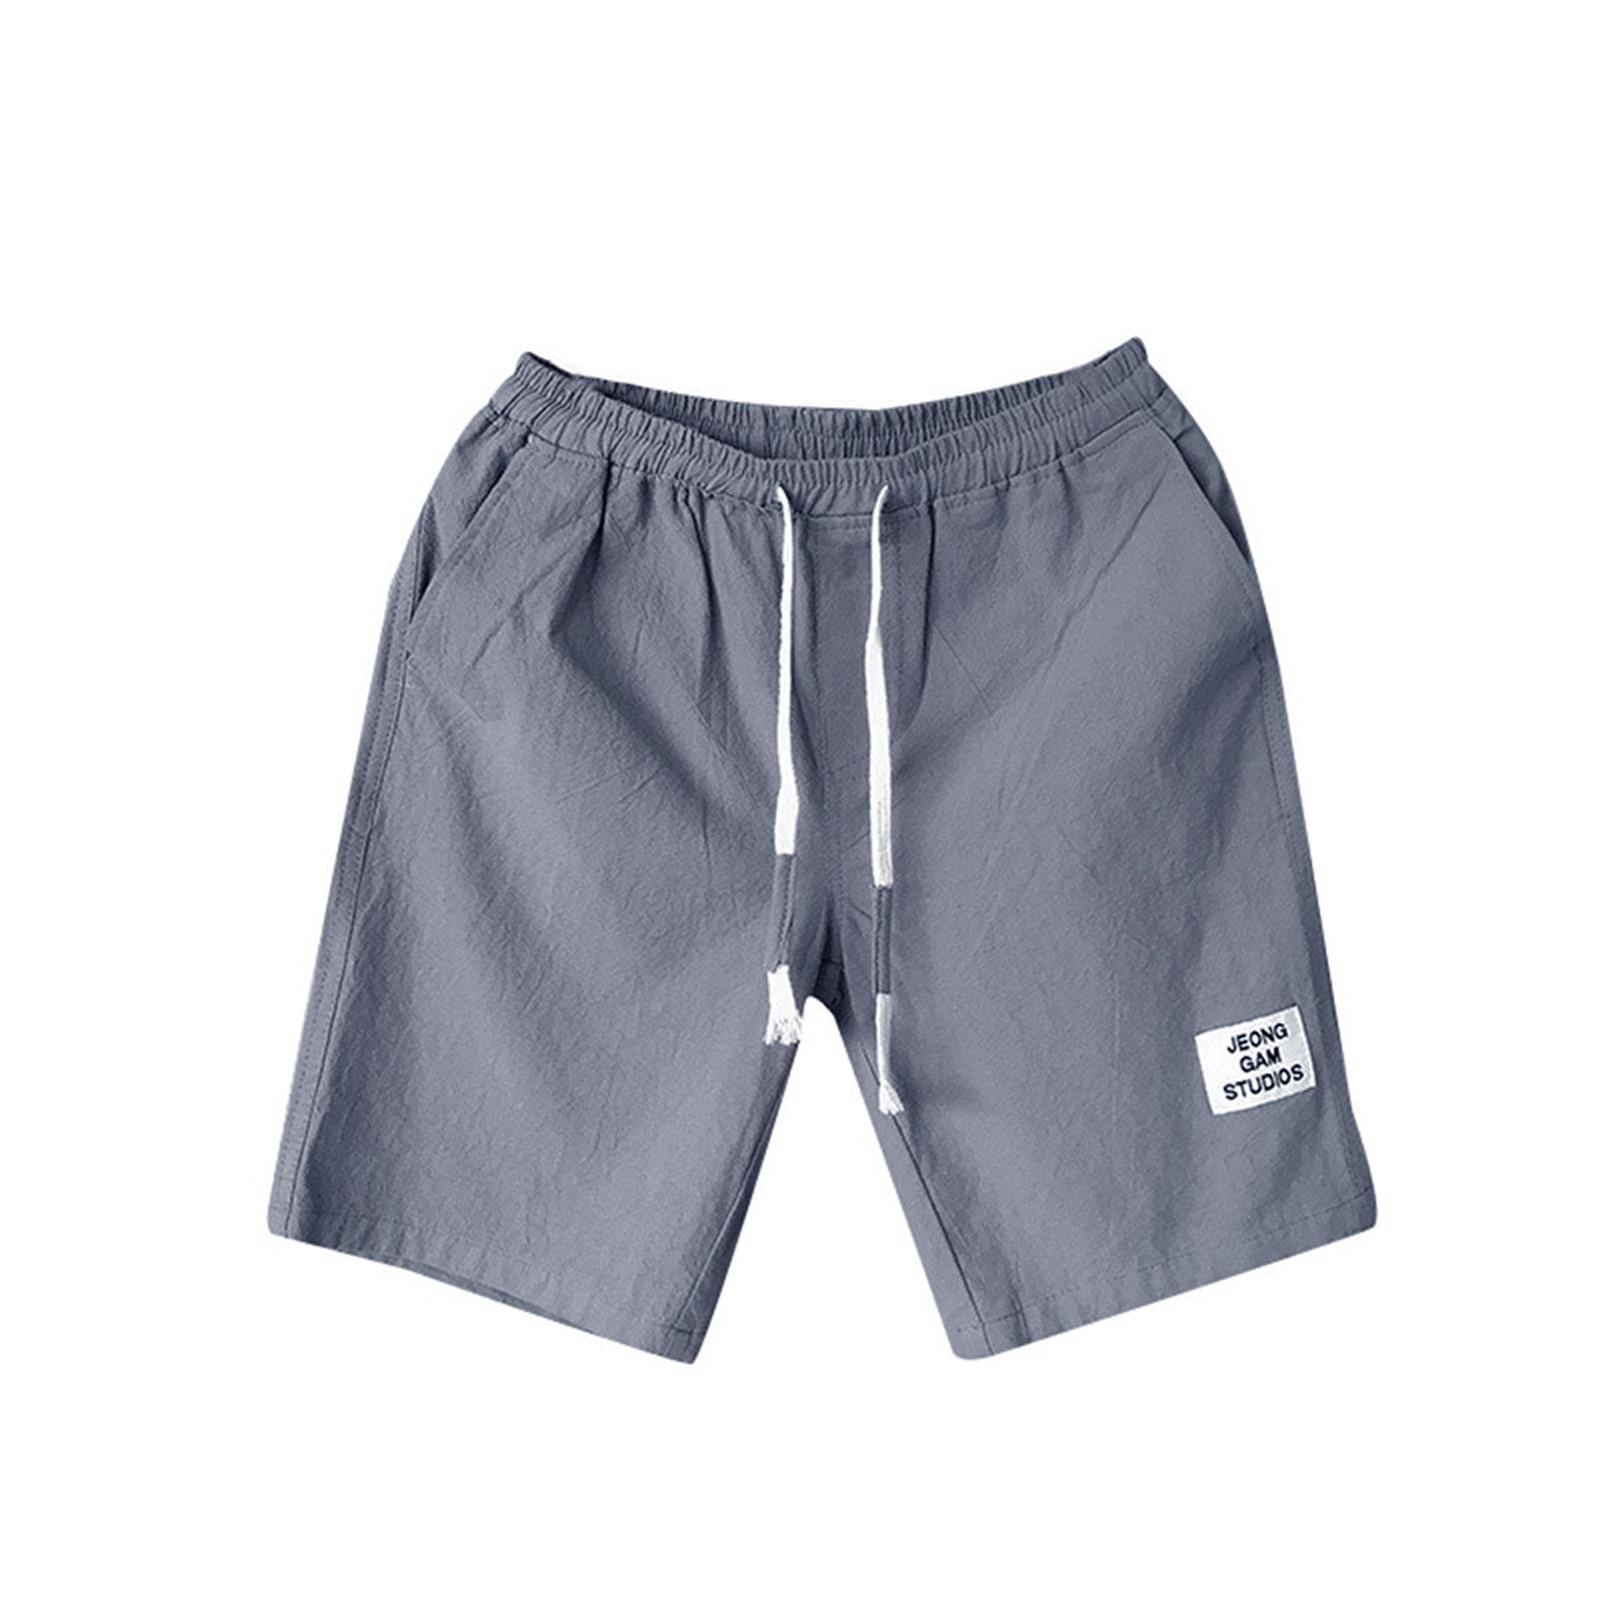 2021 New Mens Sexy Swimwear Men Swimming Shorts Men Briefs Beach Shorts Sports Suits Surf Board Shorts Men Swim Trunks 5